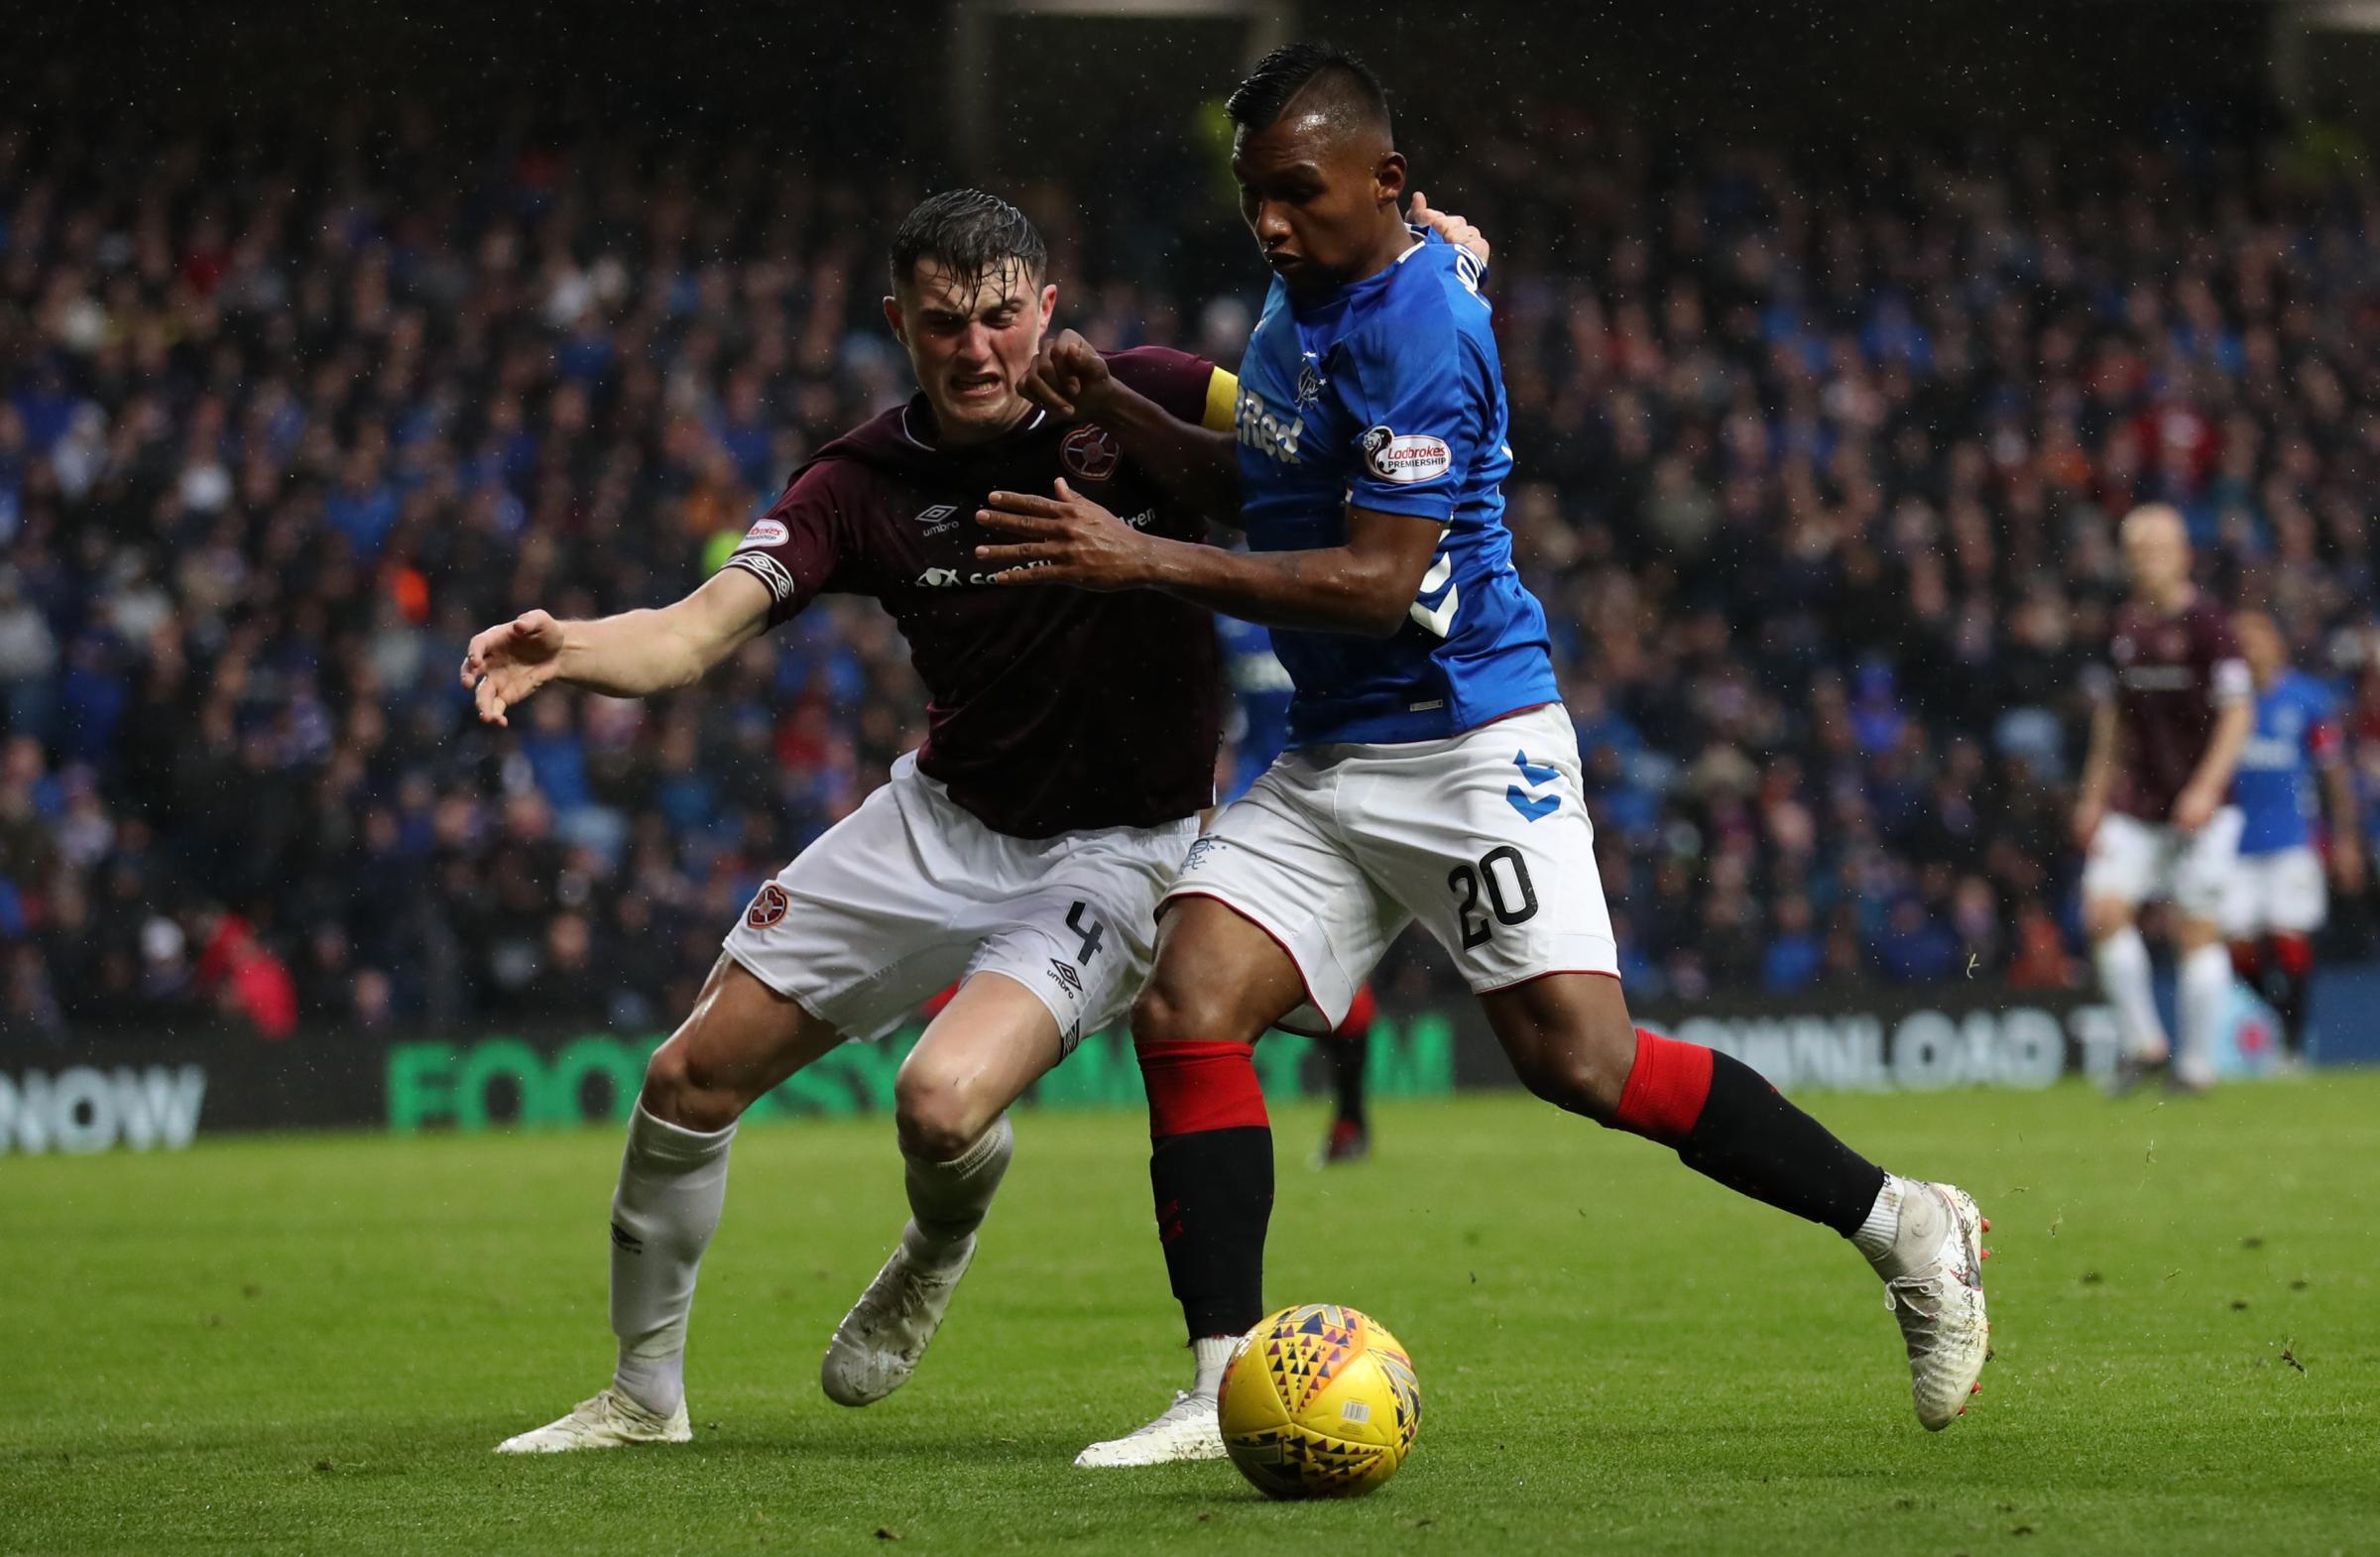 BBC hits back at Rangers after Stewart Robertson criticism